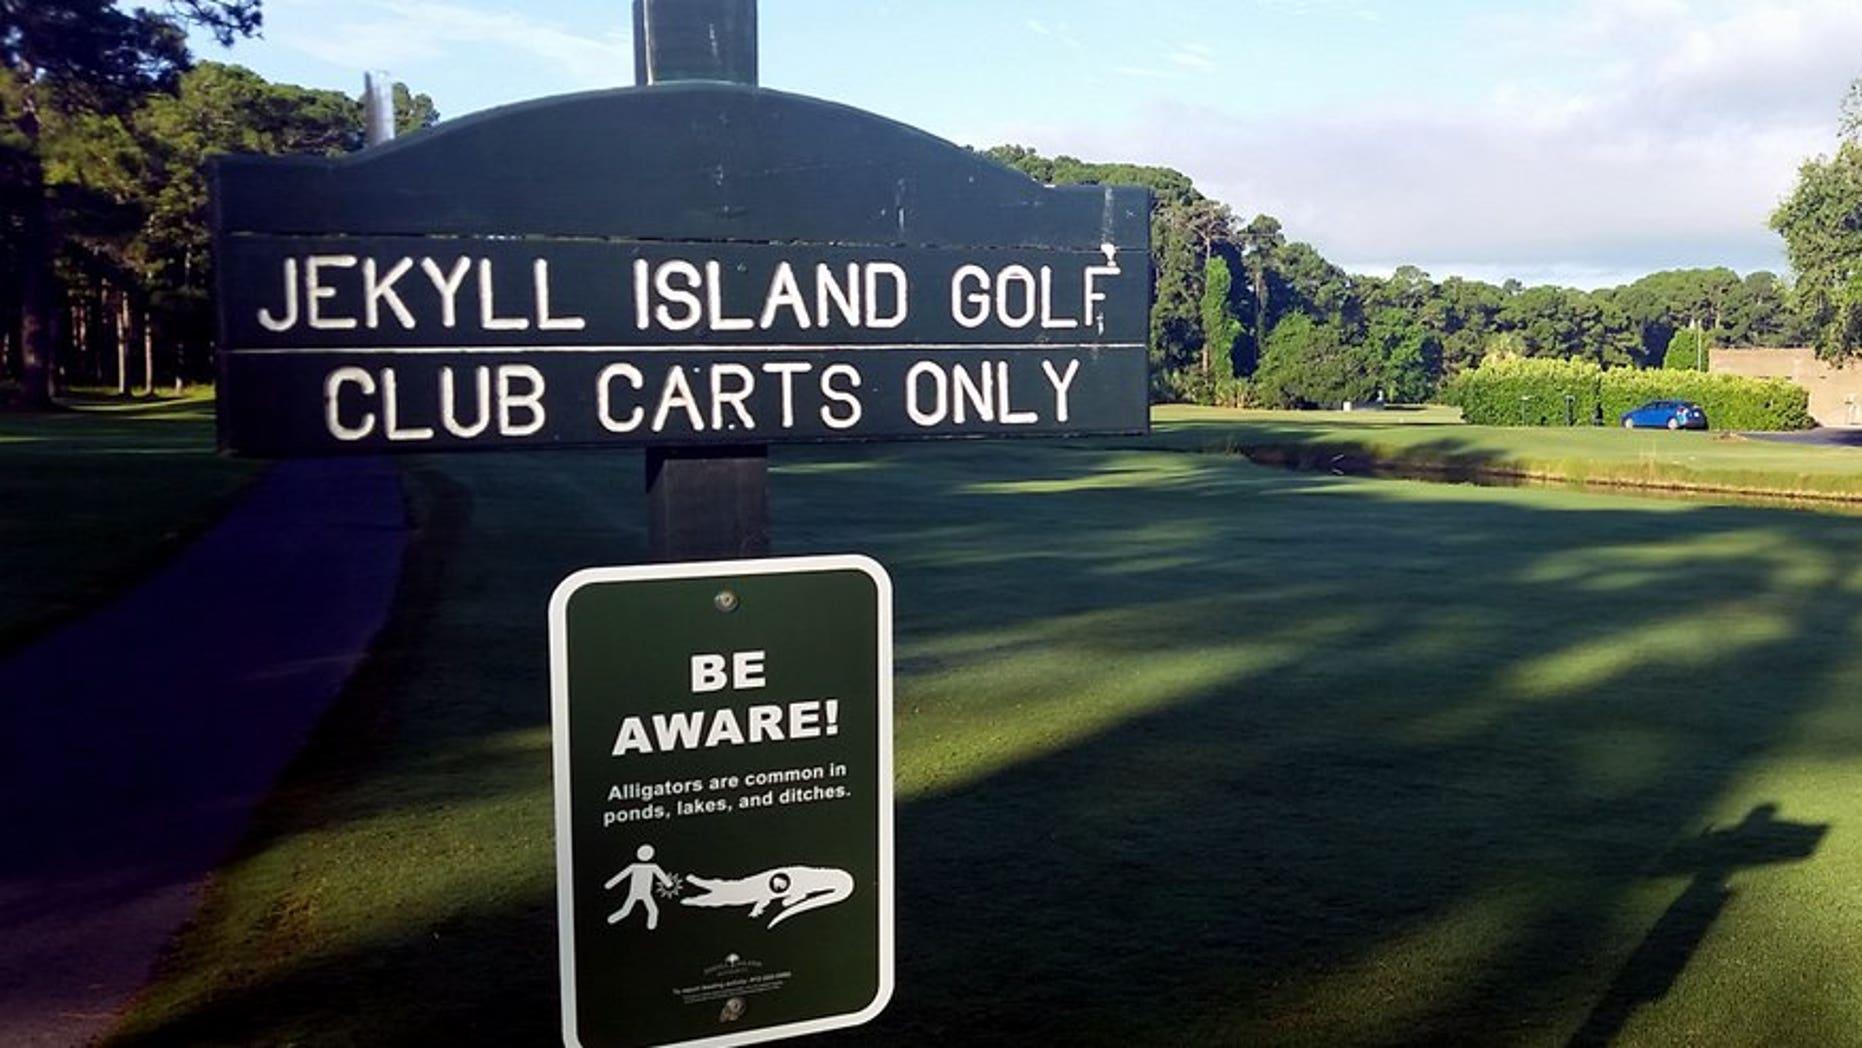 Georgia's Jekyll Island posts more alligator warning signs